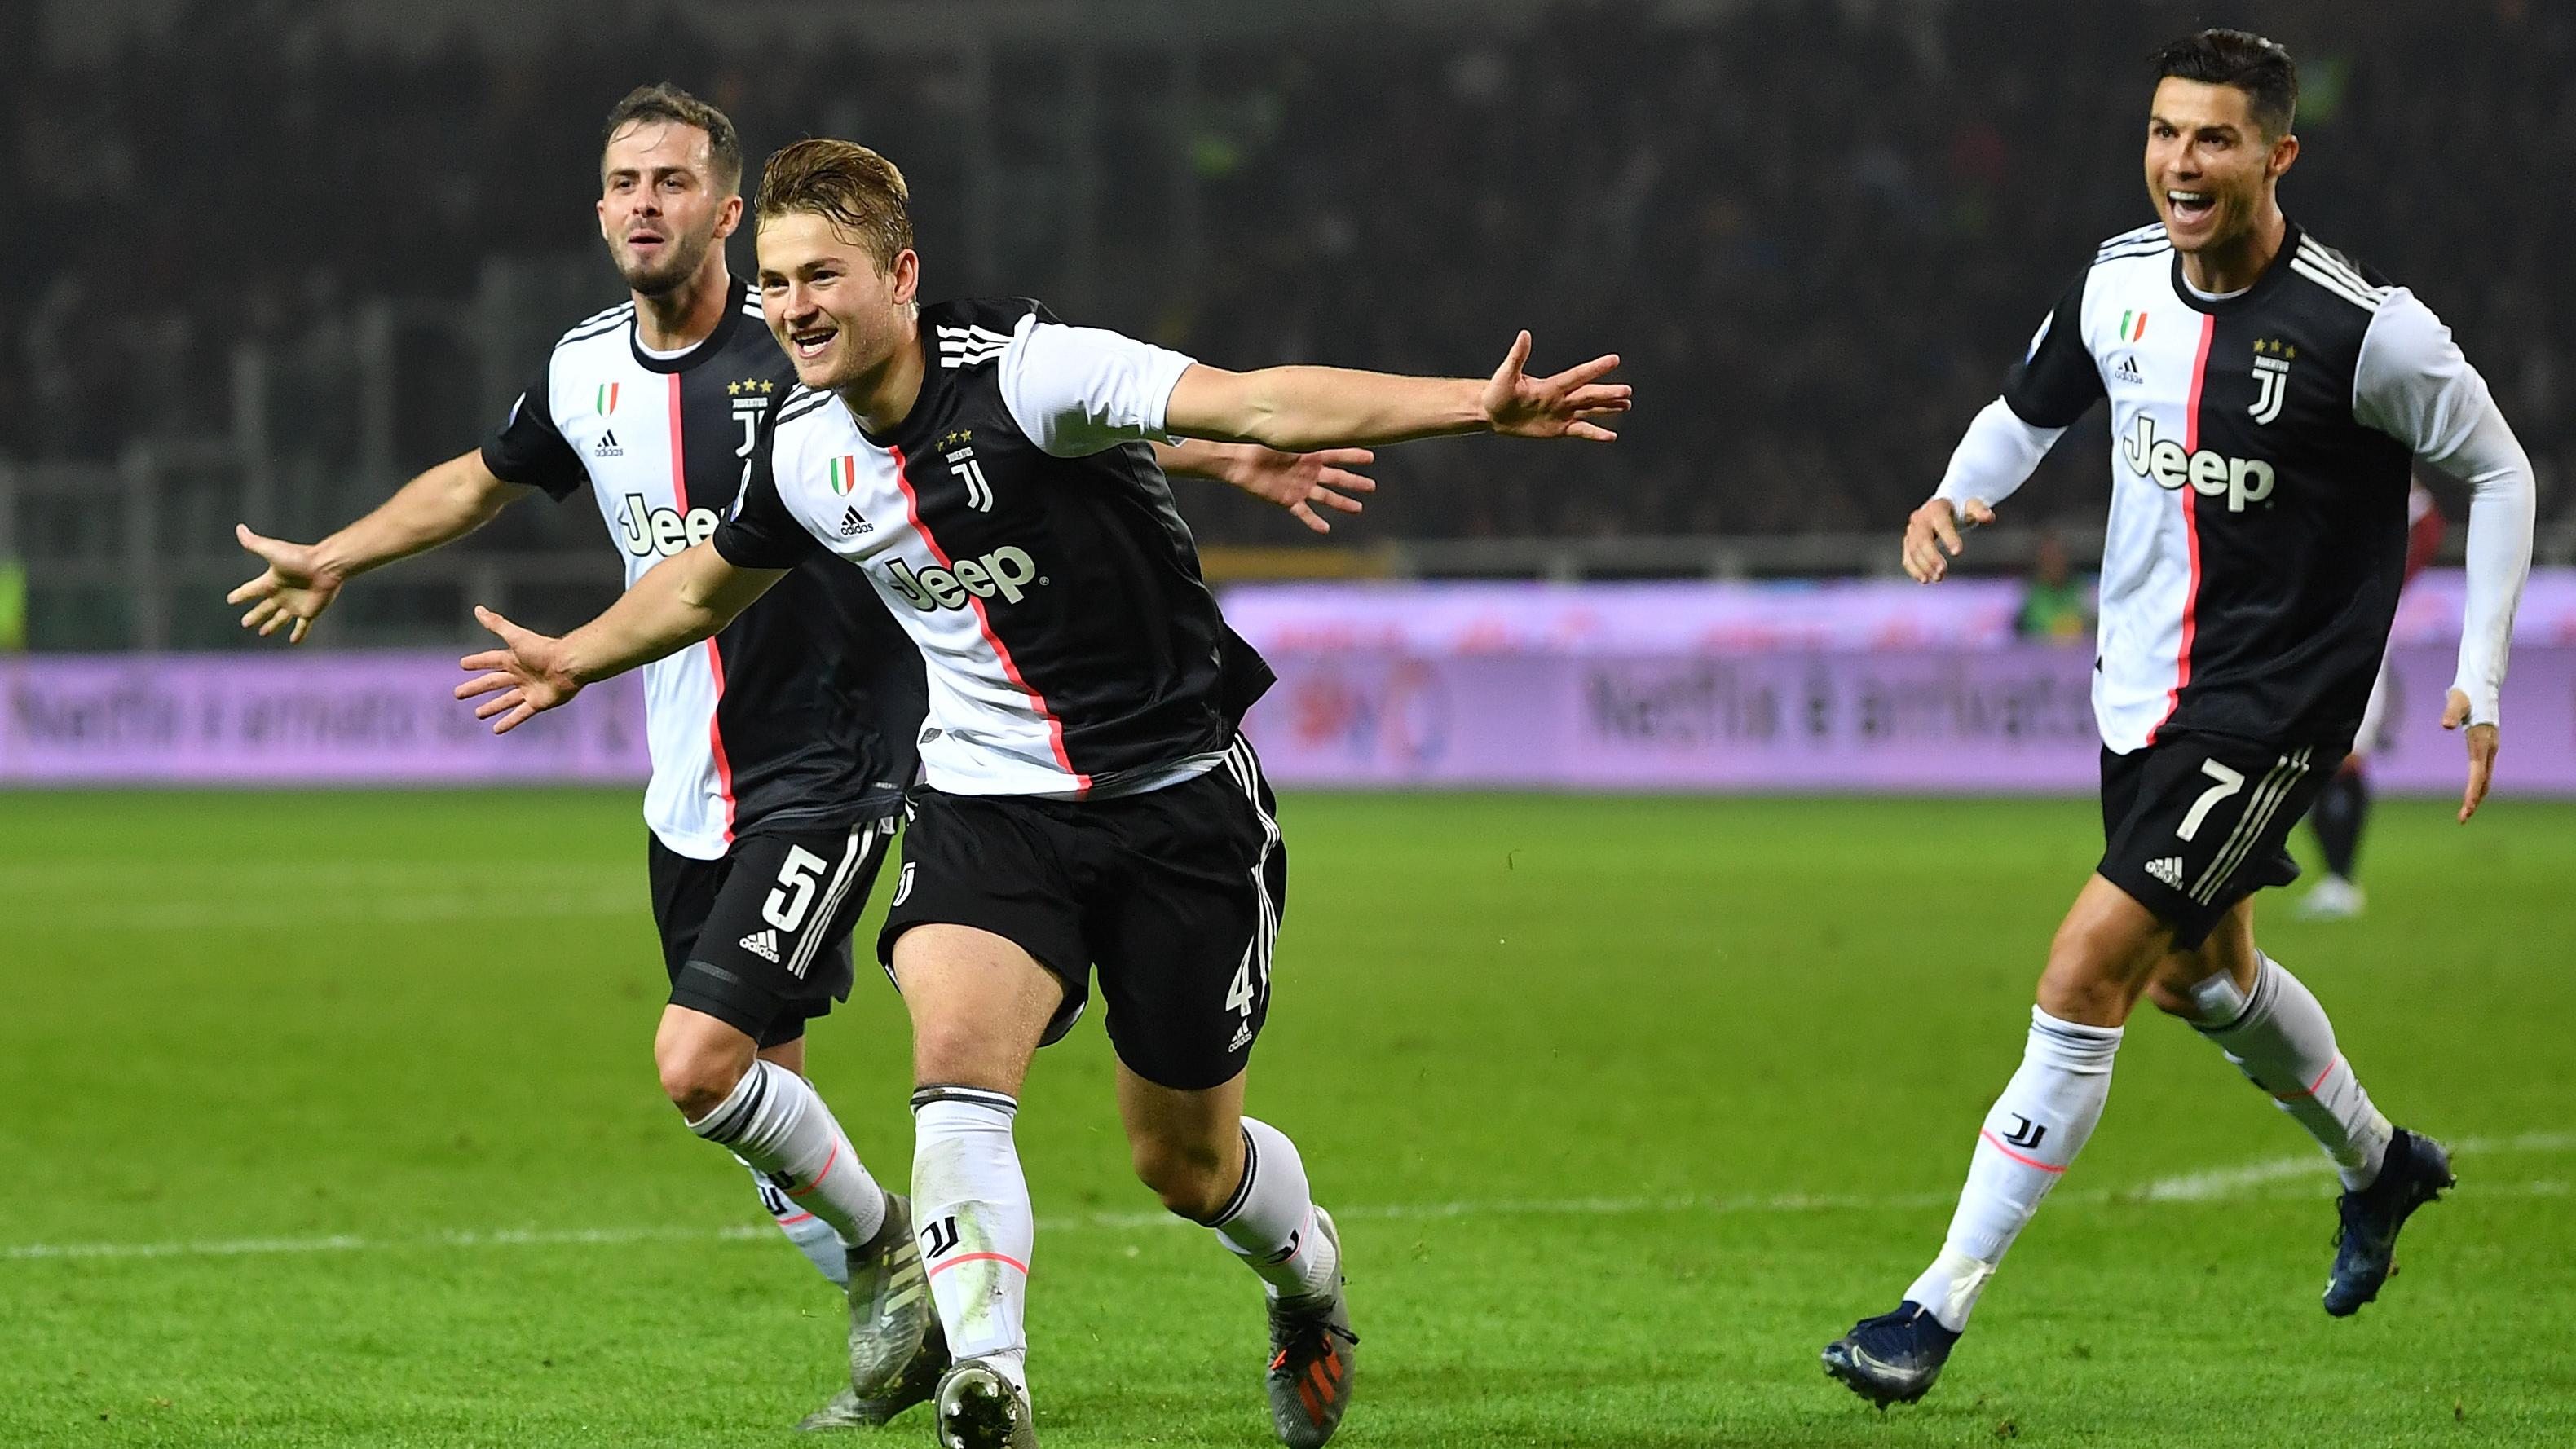 De Ligt savours scoring 'special' Juventus winner as he settles into Serie A